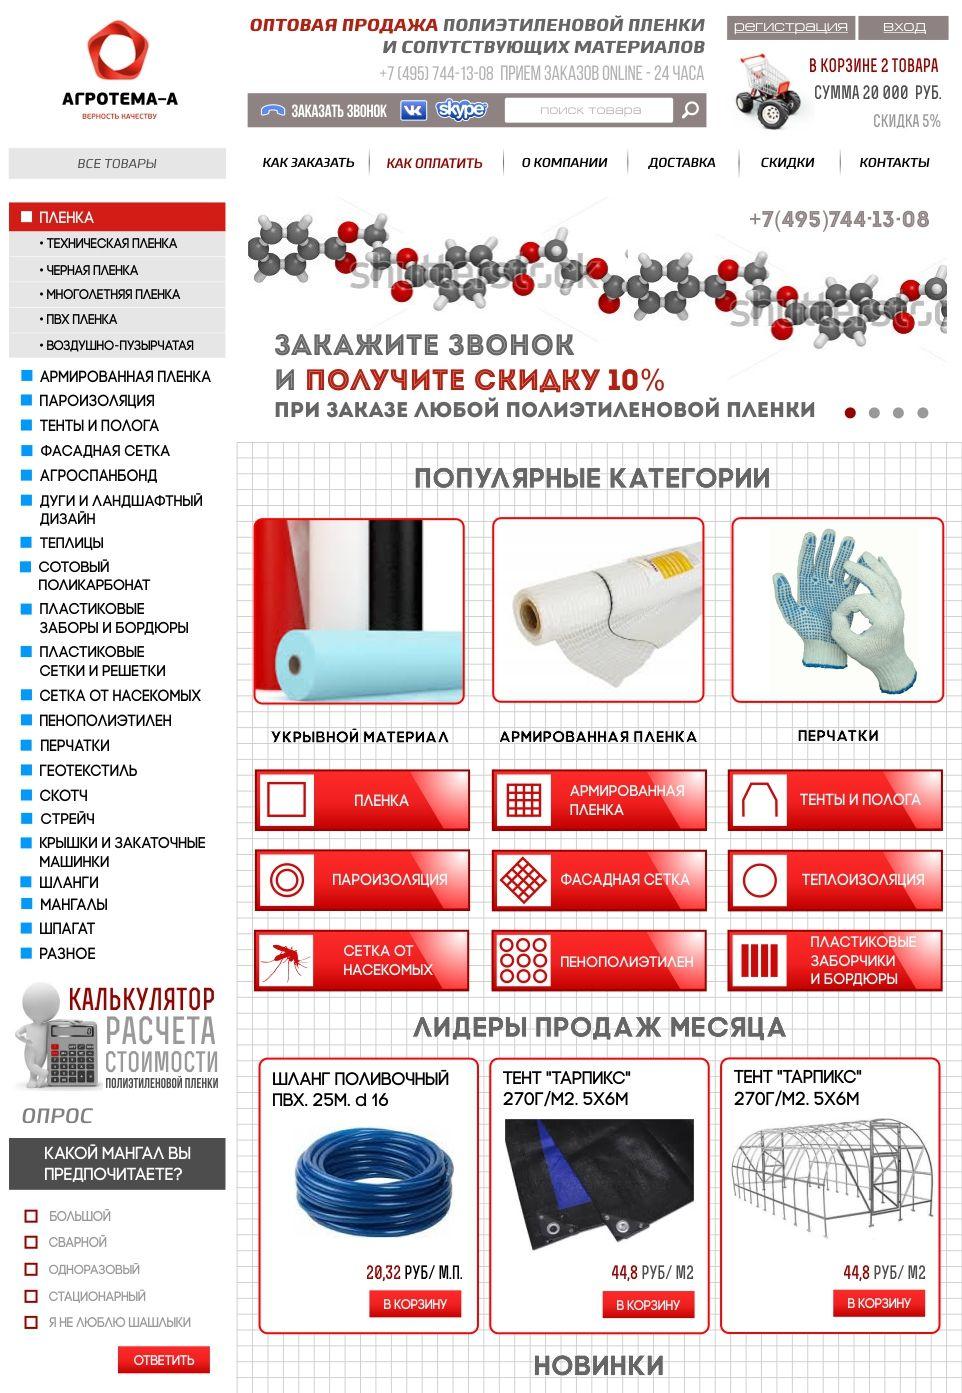 Новая главная страница agrotema.ru - дизайнер StasHerz